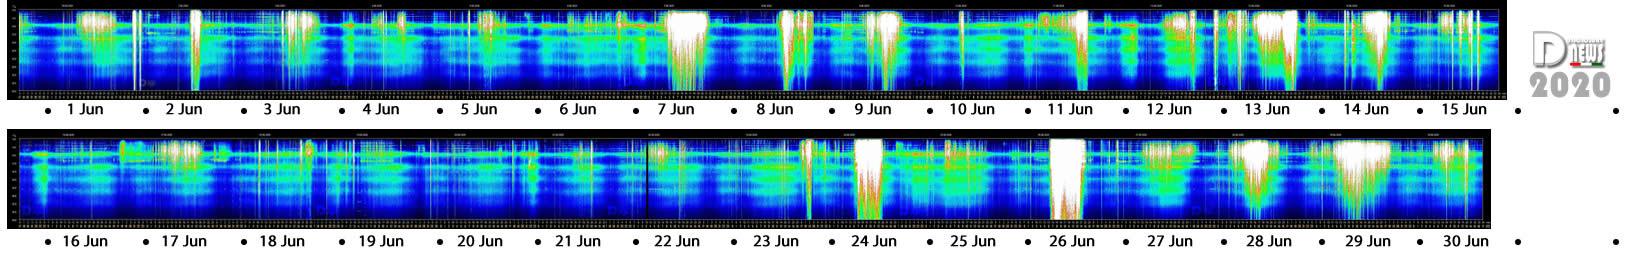 Schumann Resonance Changing Increasing Charts